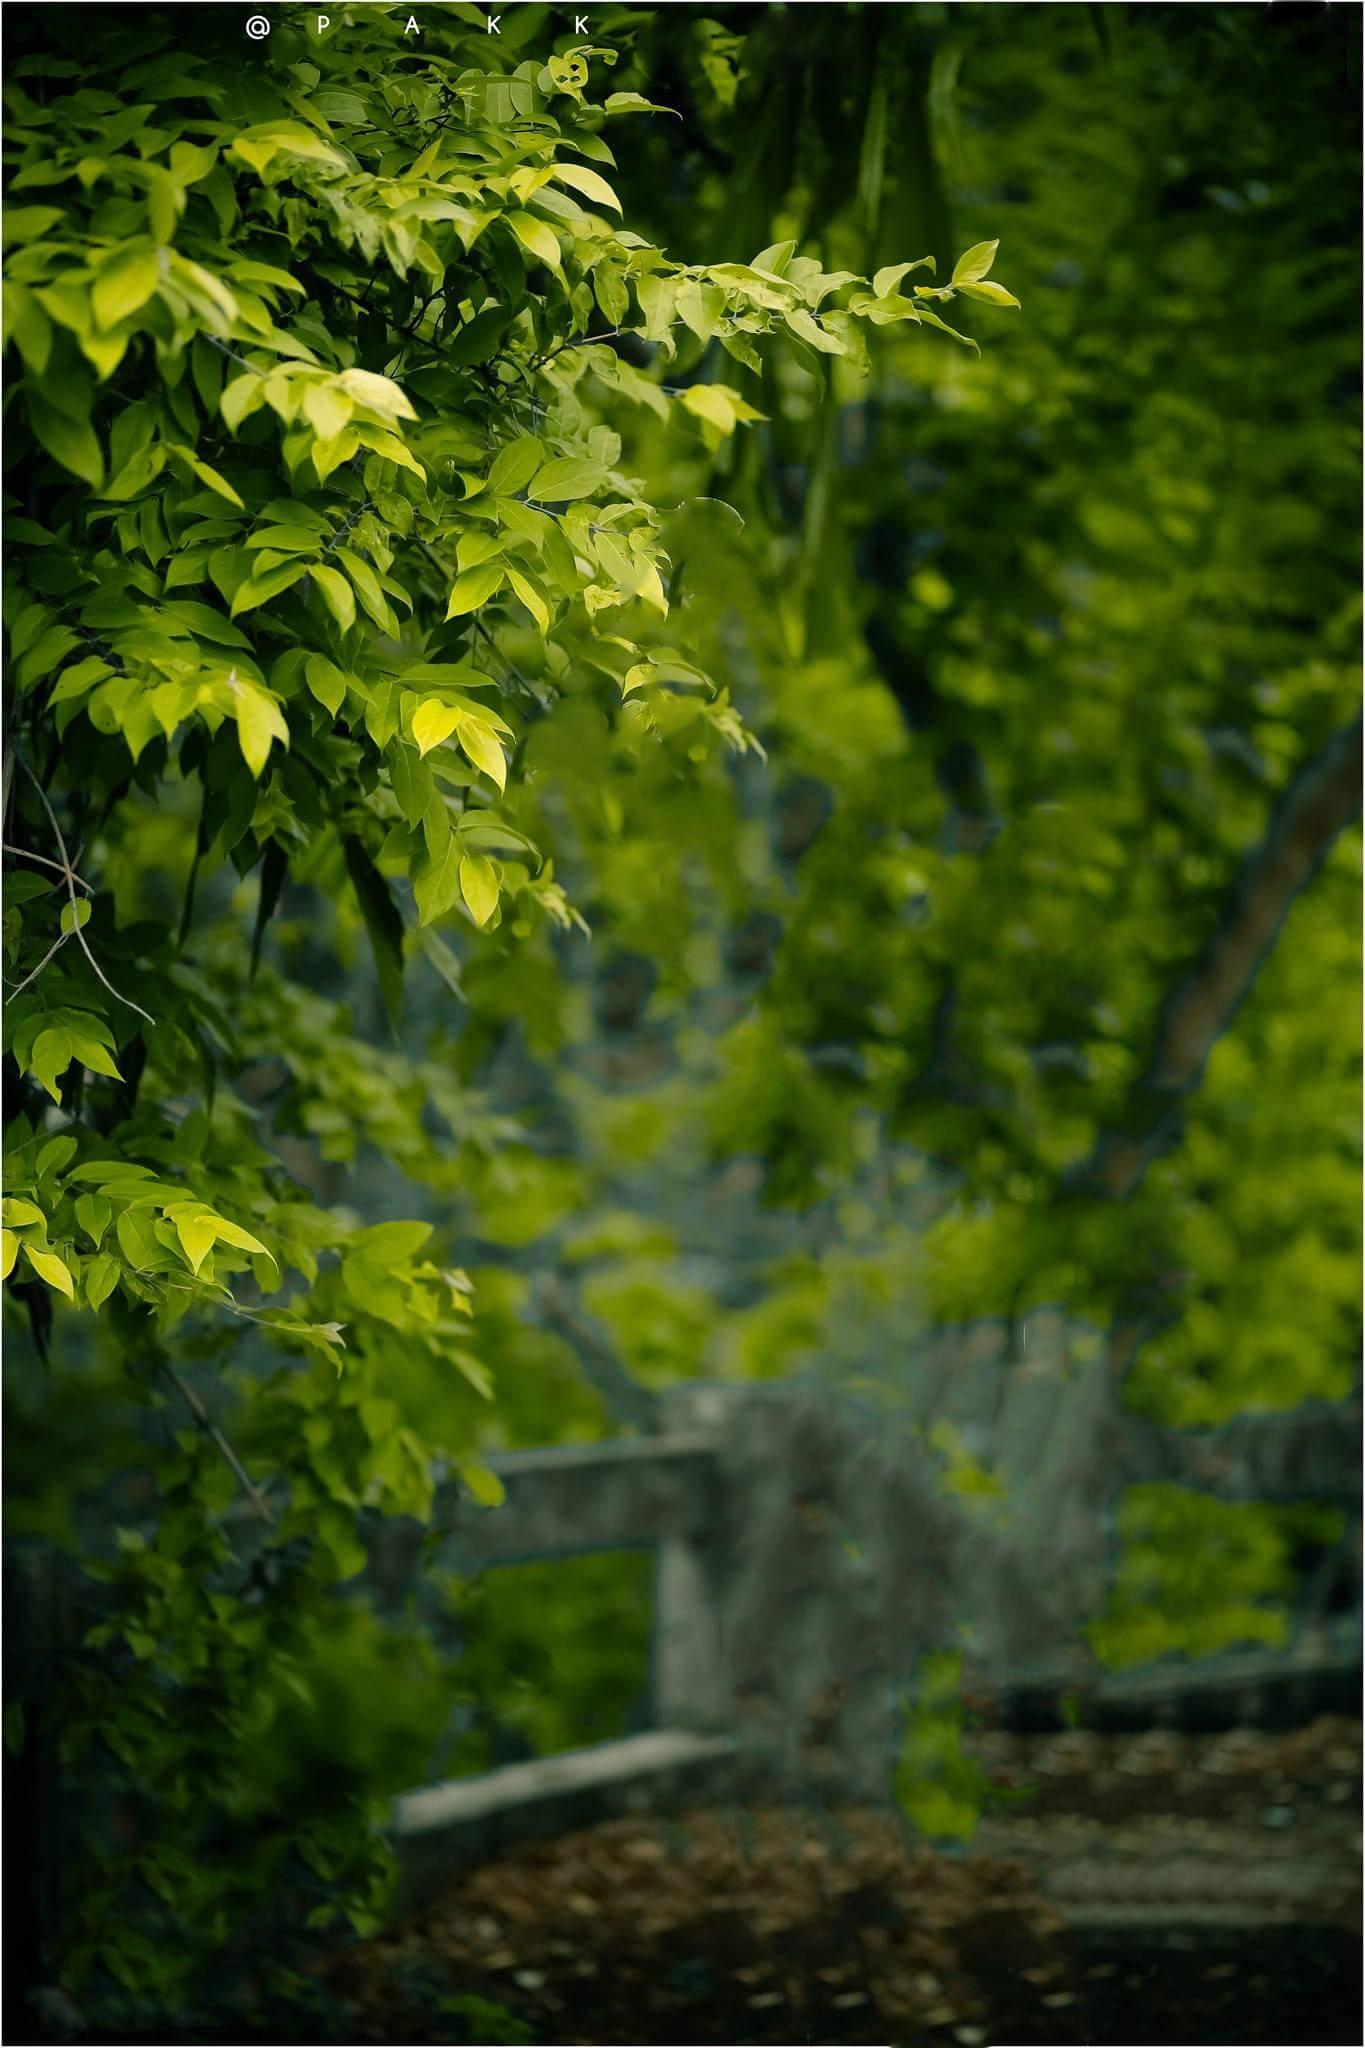 Pin By Phemzyfm John On Creative Dslr Background Images Picsart Background Blur Photo Background